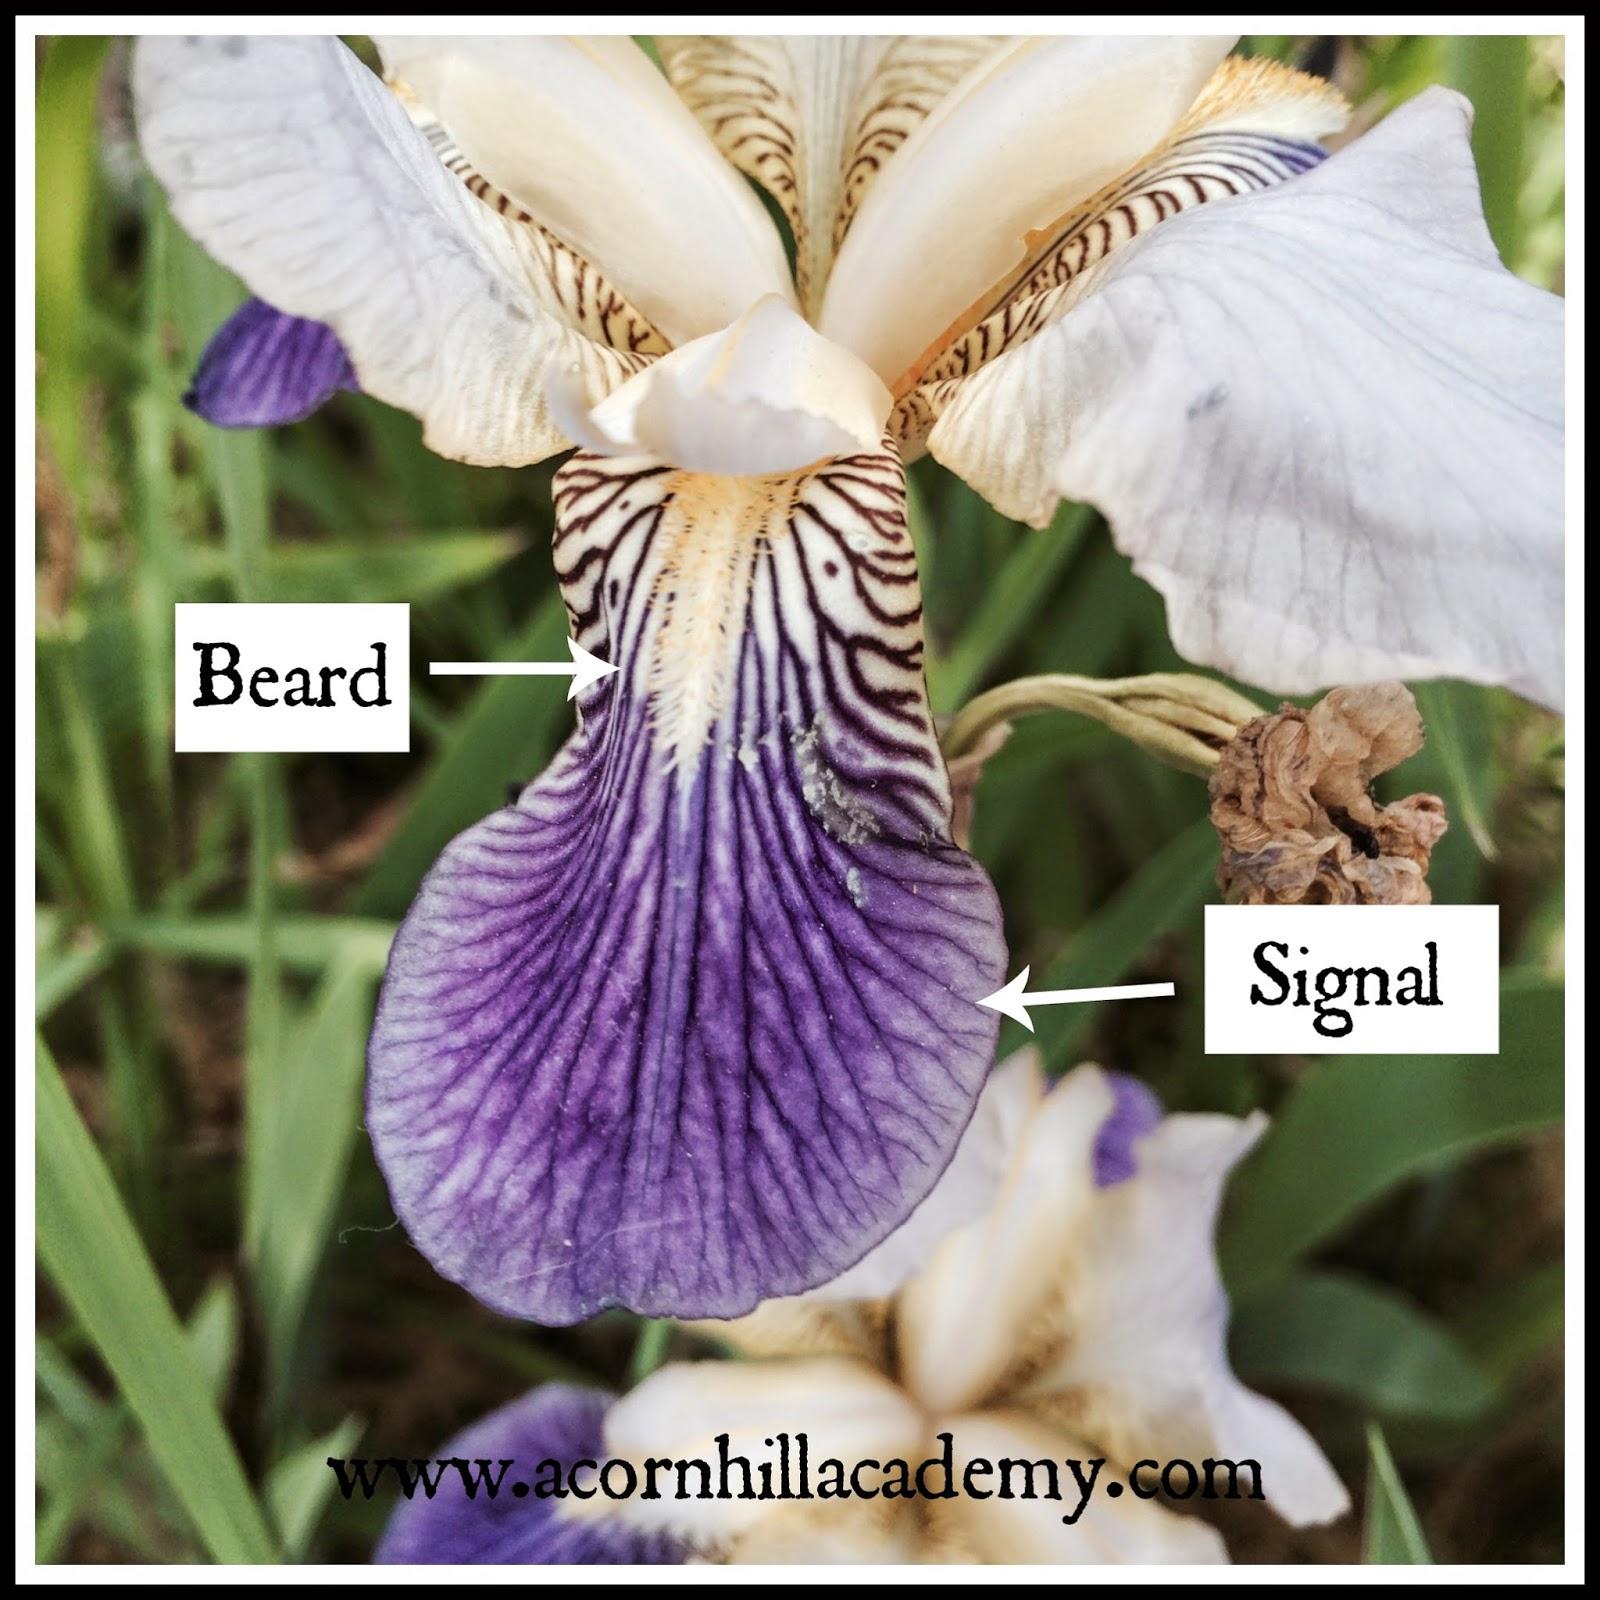 Acorn Hill Academy Nature Study Iris